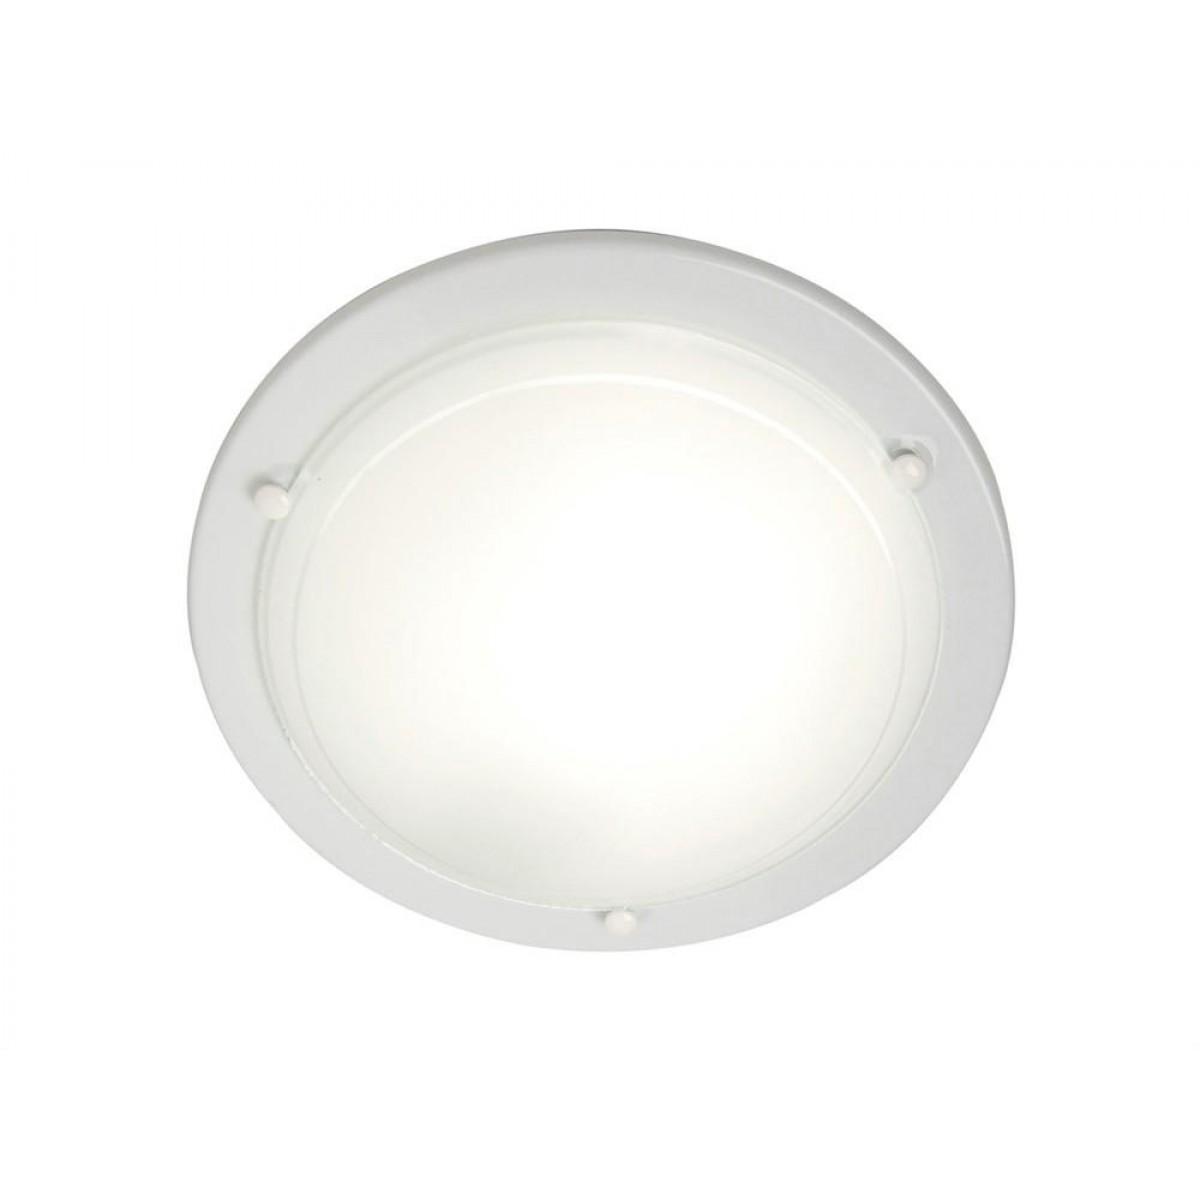 NORDLUX Spinner plafond hvid / glas